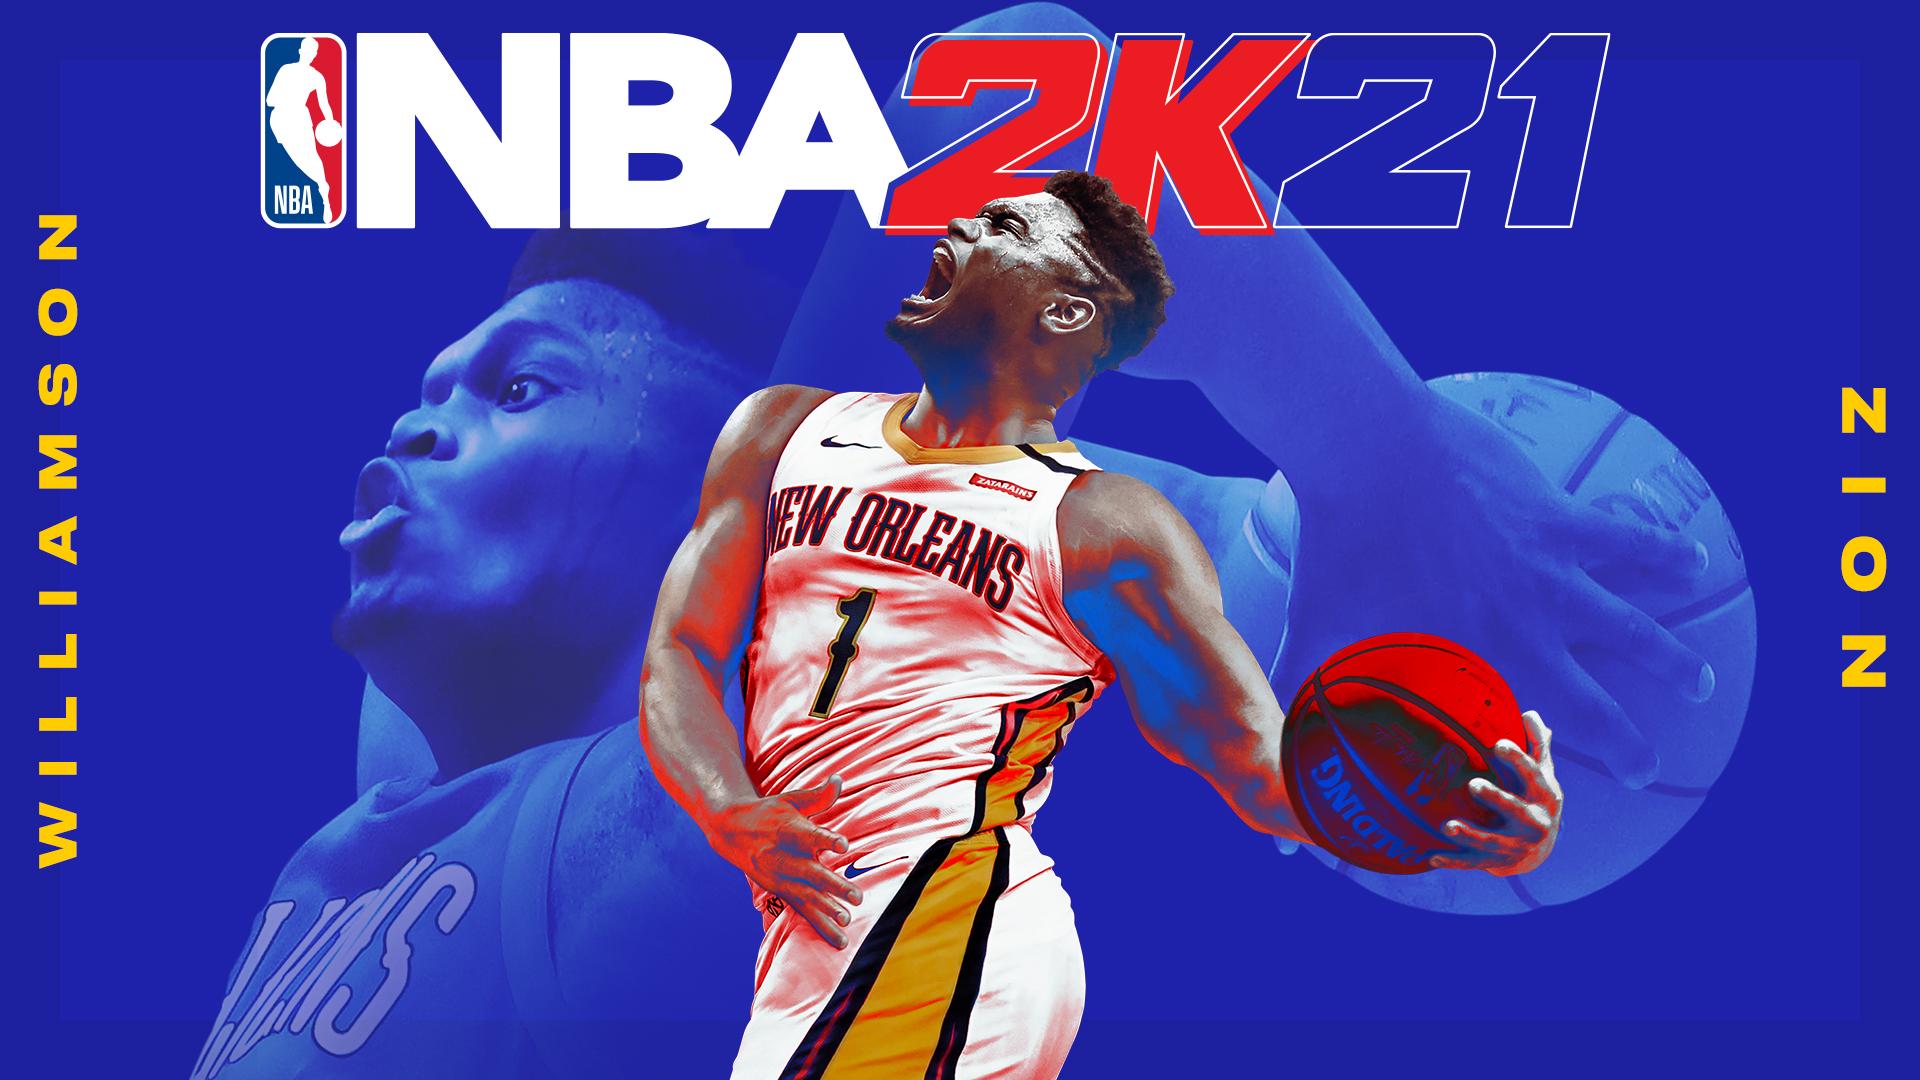 NBA 2K21 Prelude update